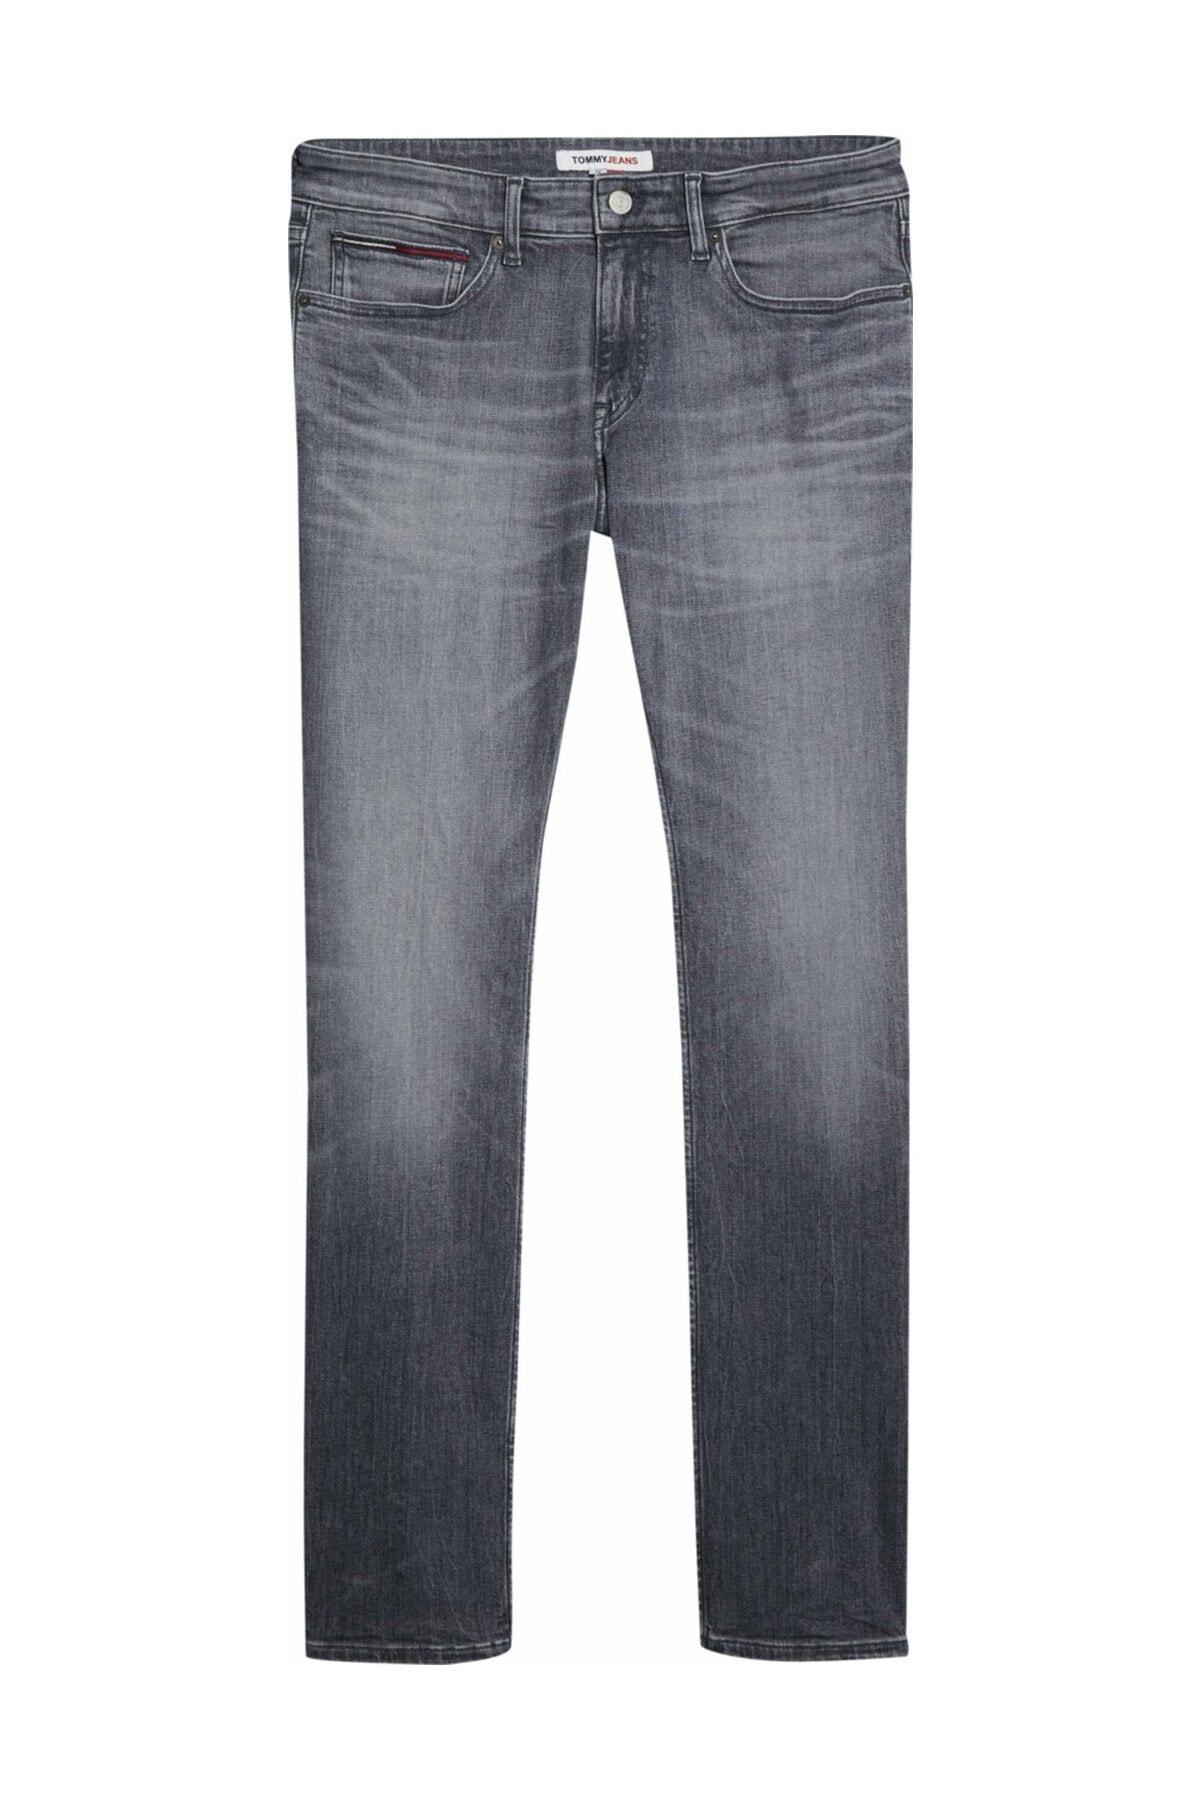 Tommy Hilfiger Erkek Denim Jeans Scanton Slım Mngrst DM0DM09282 1